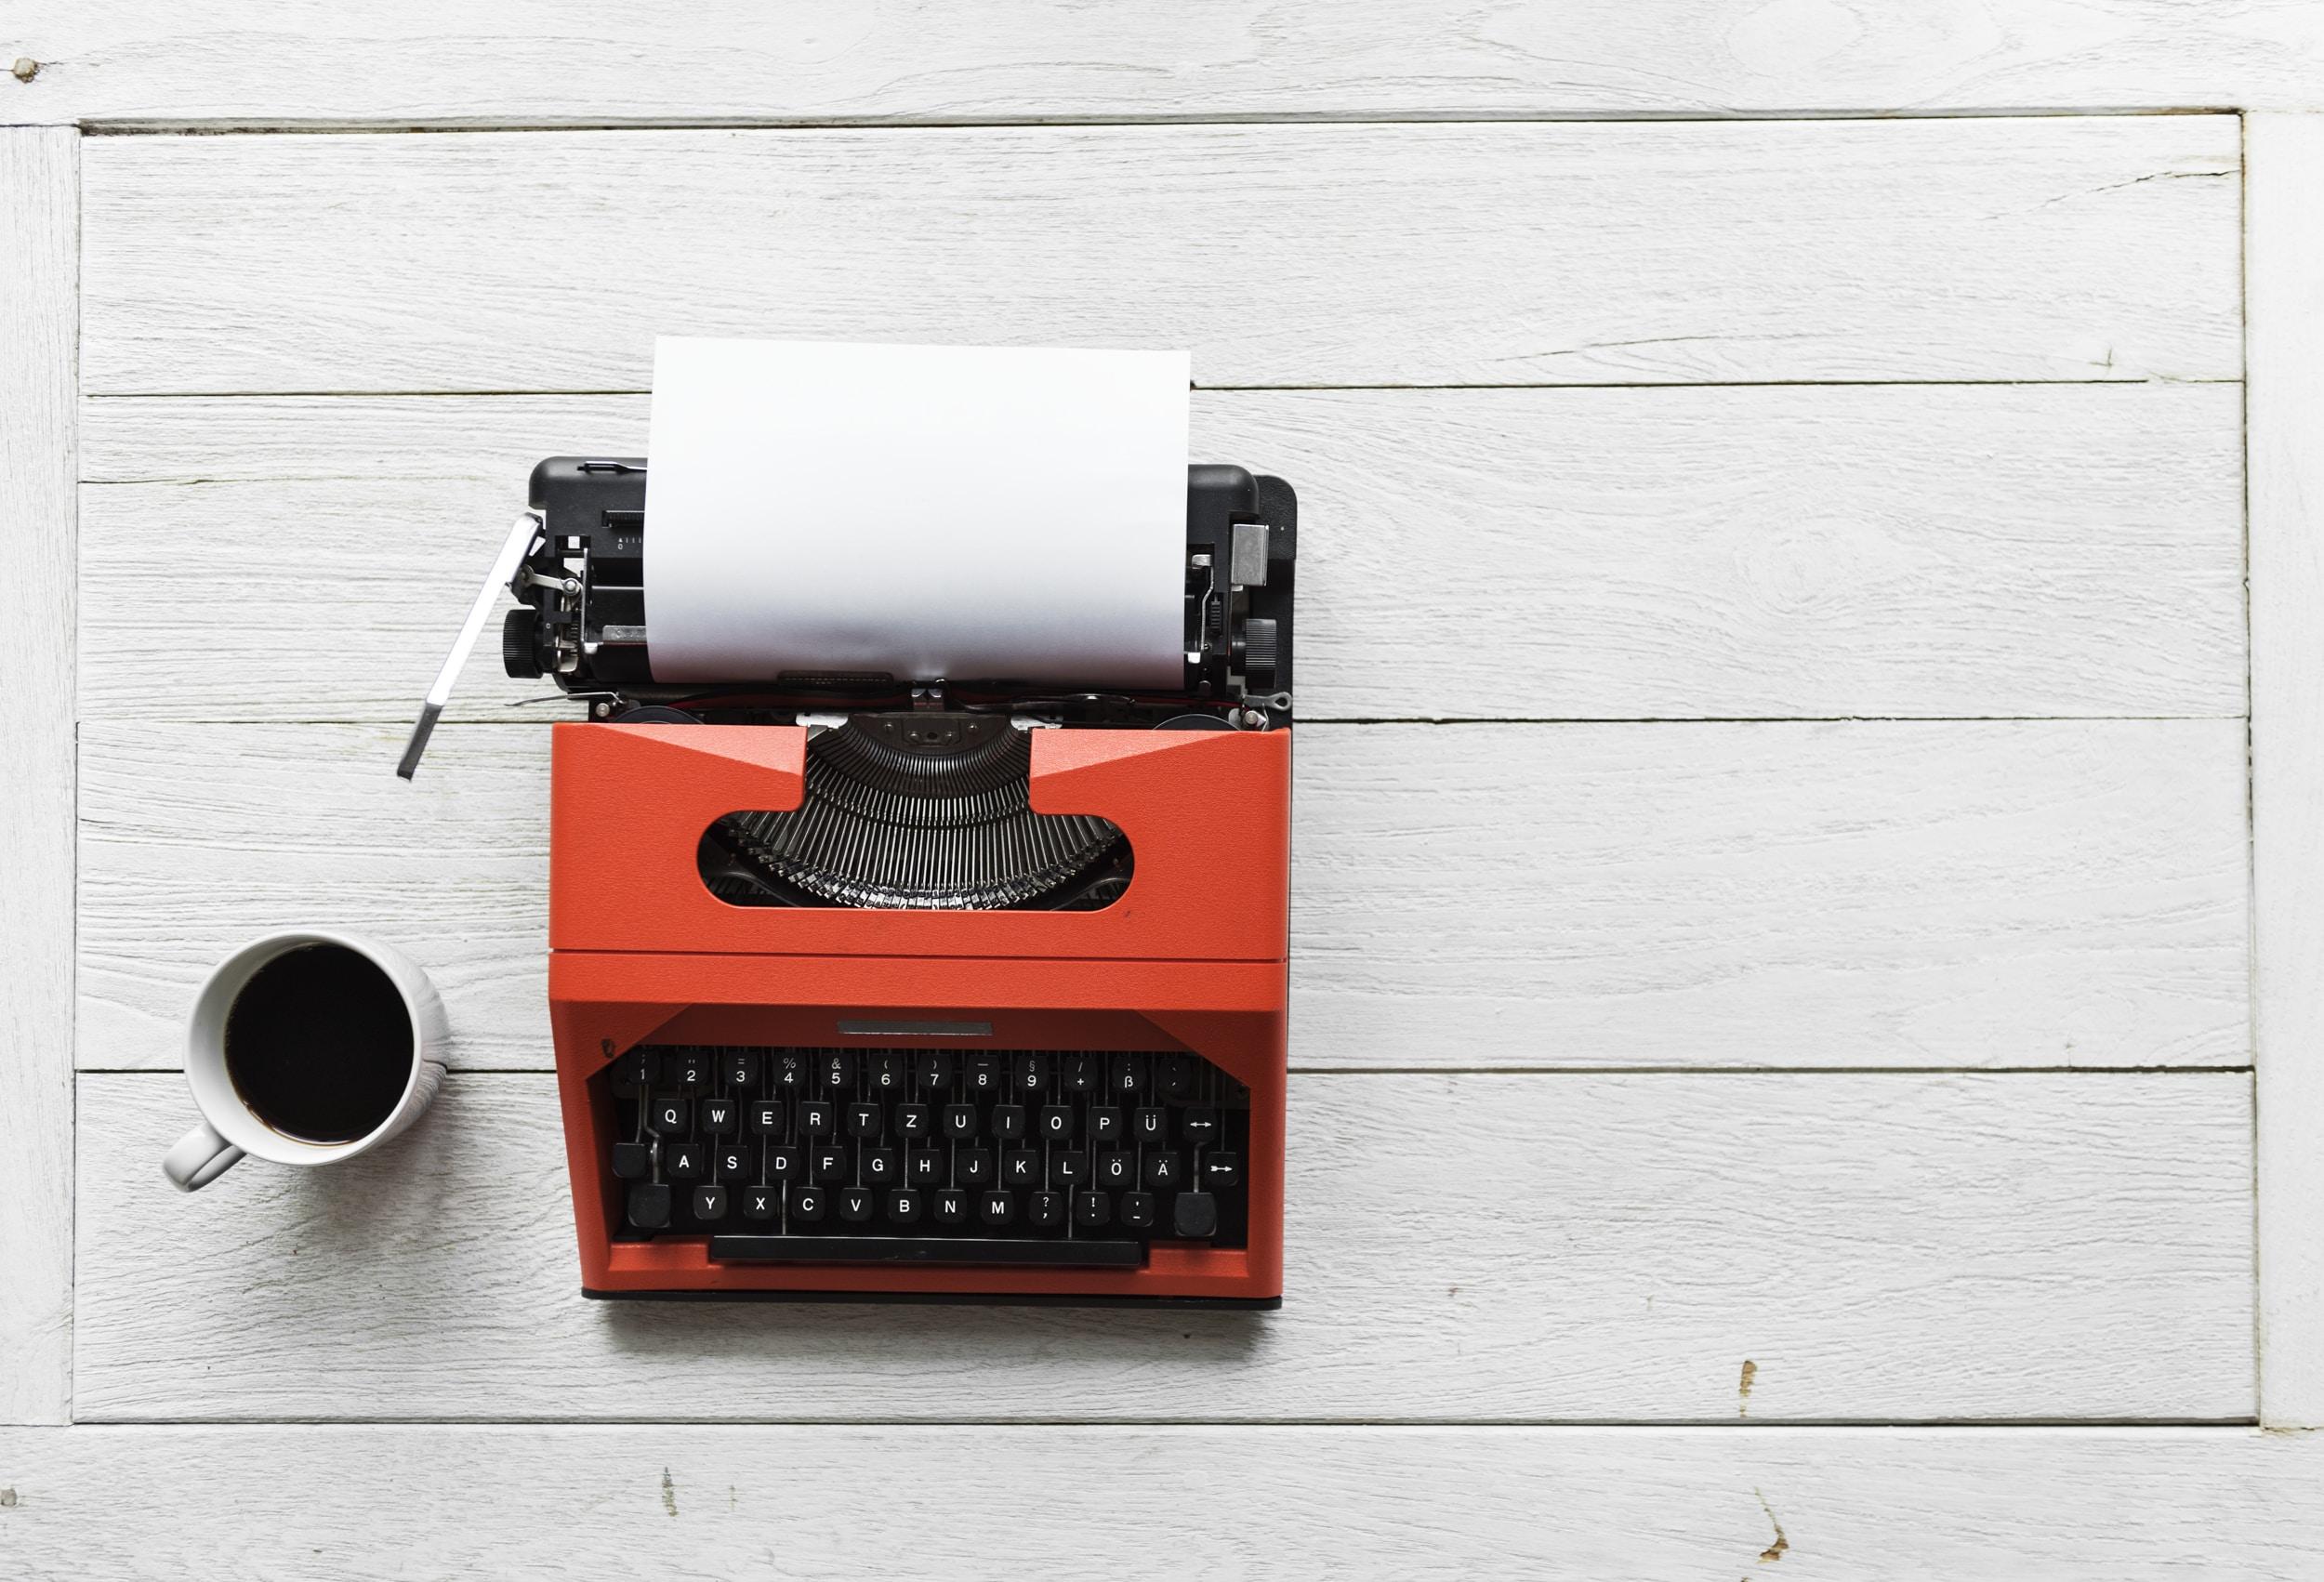 red and black typewriter near white ceramic mug with coffee